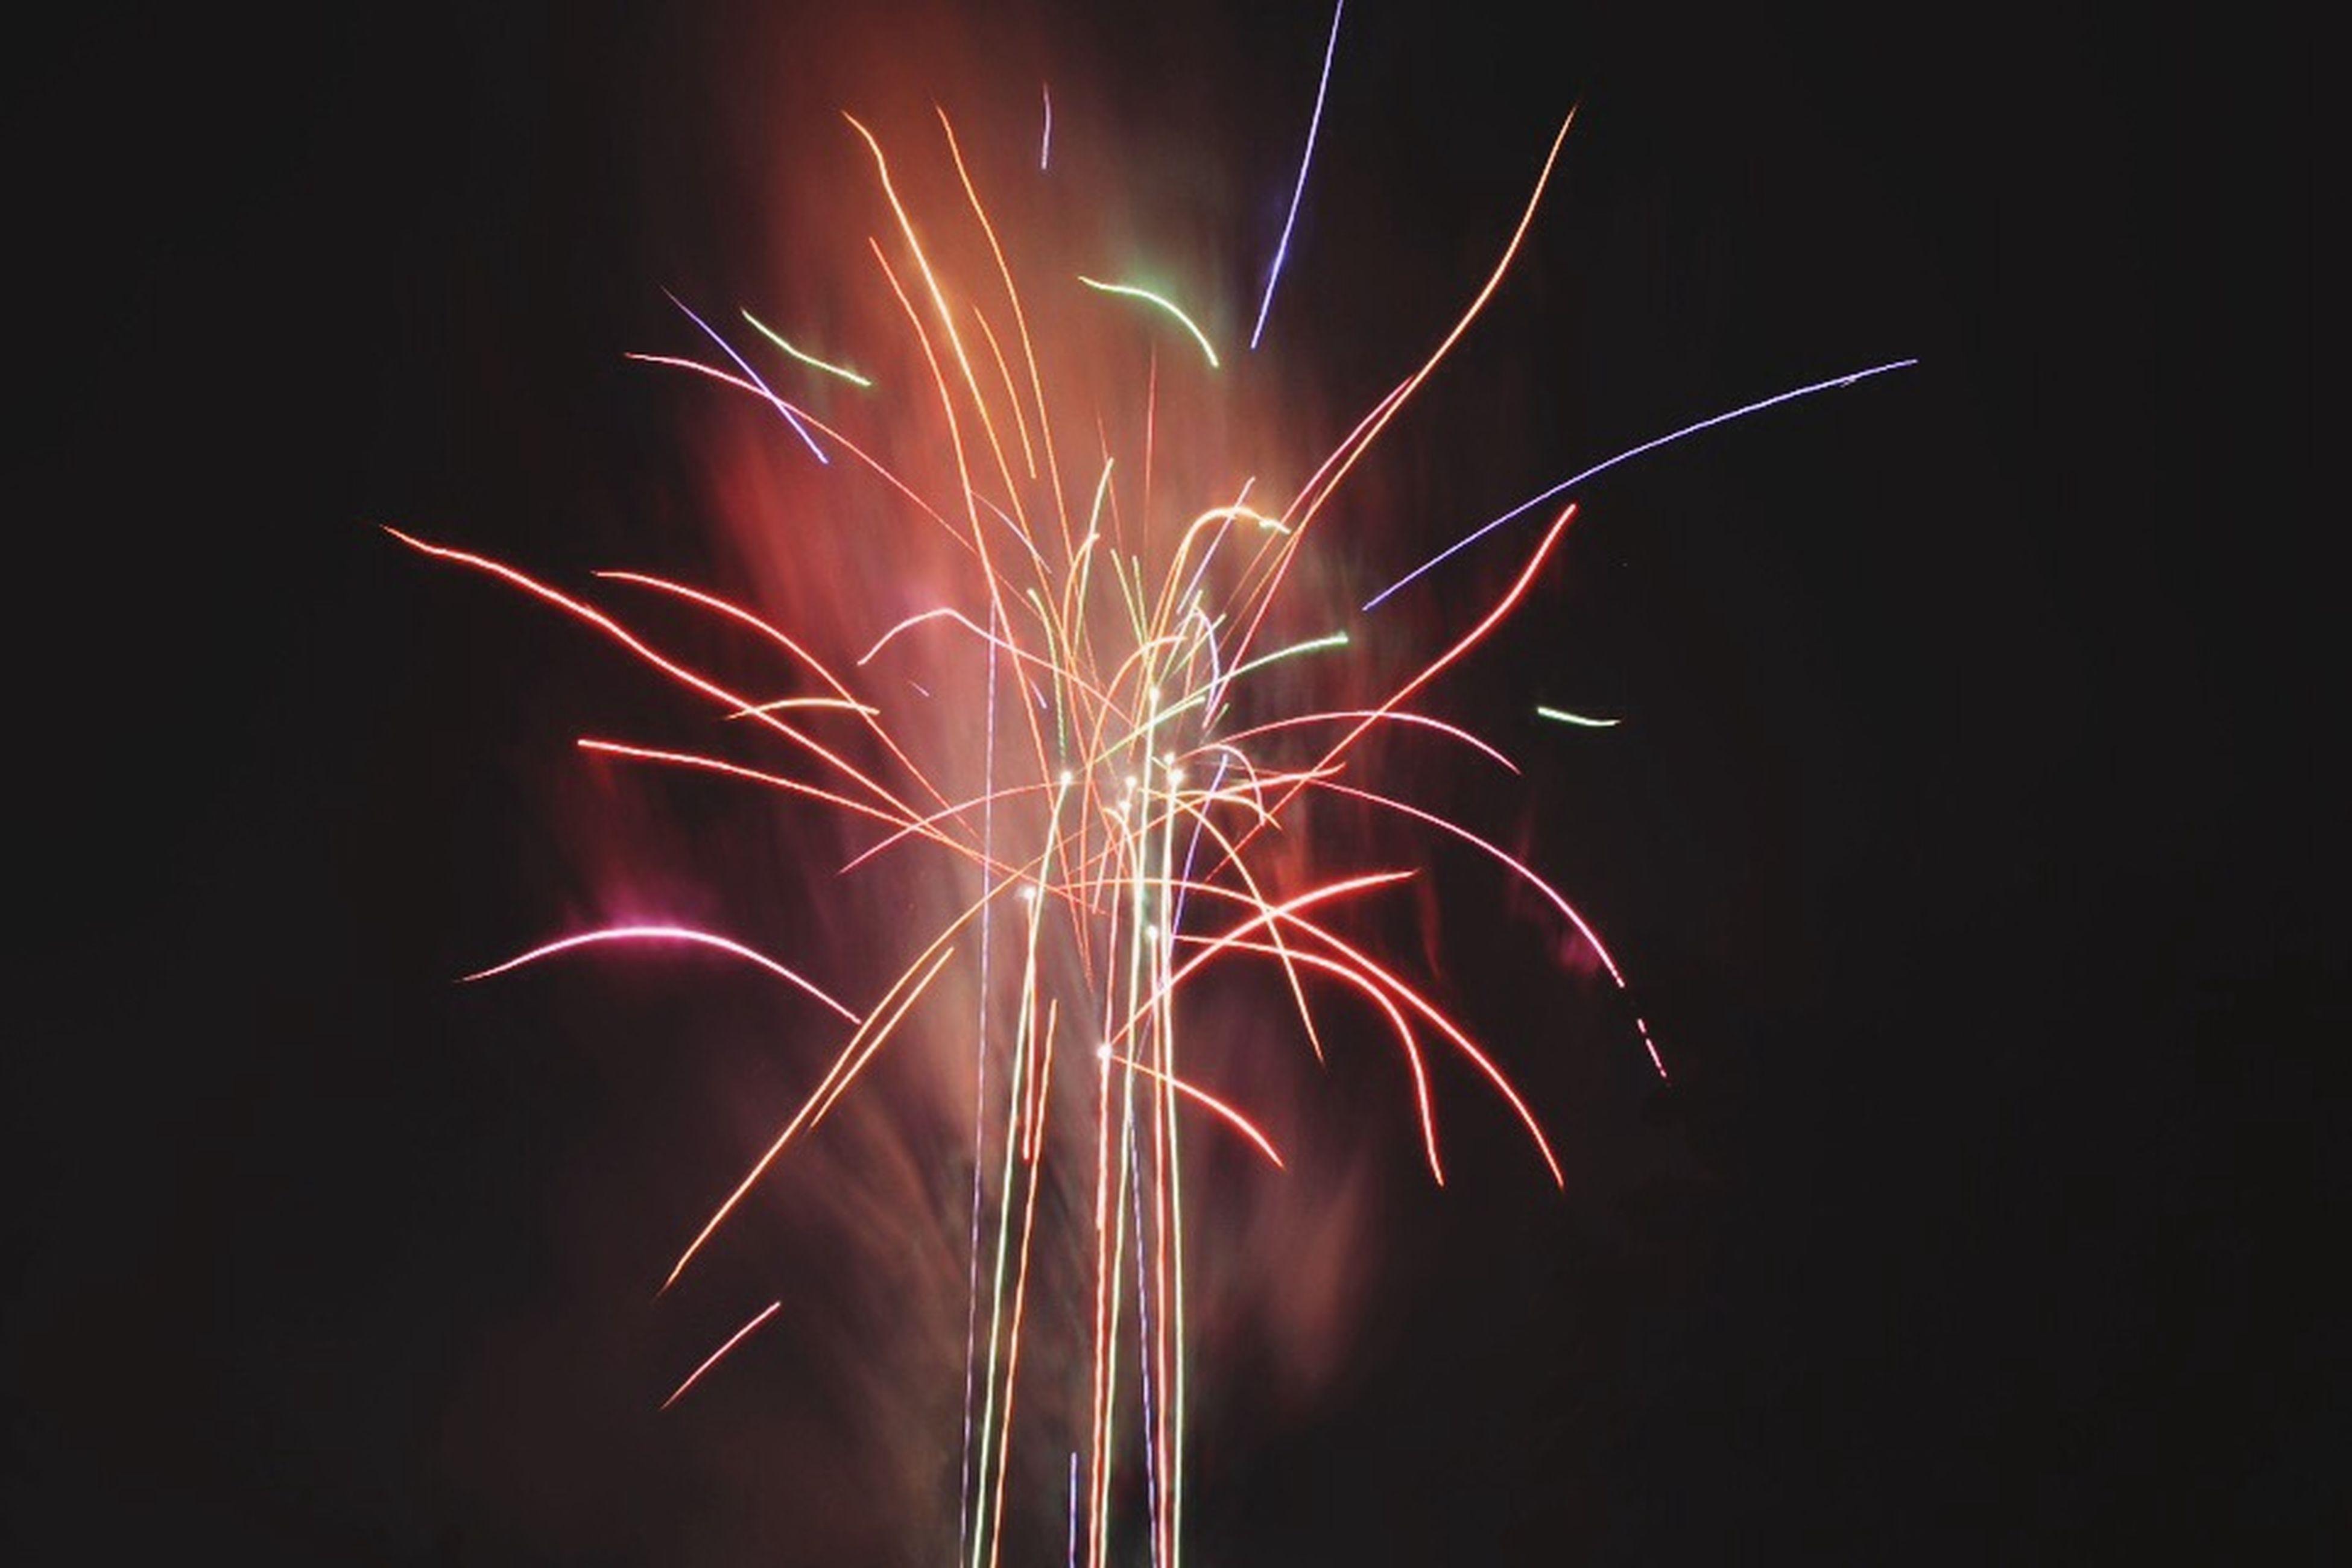 Fireworks Nightphotography Night Fireworks Light Netherlands The Netherlands Slow Shutter